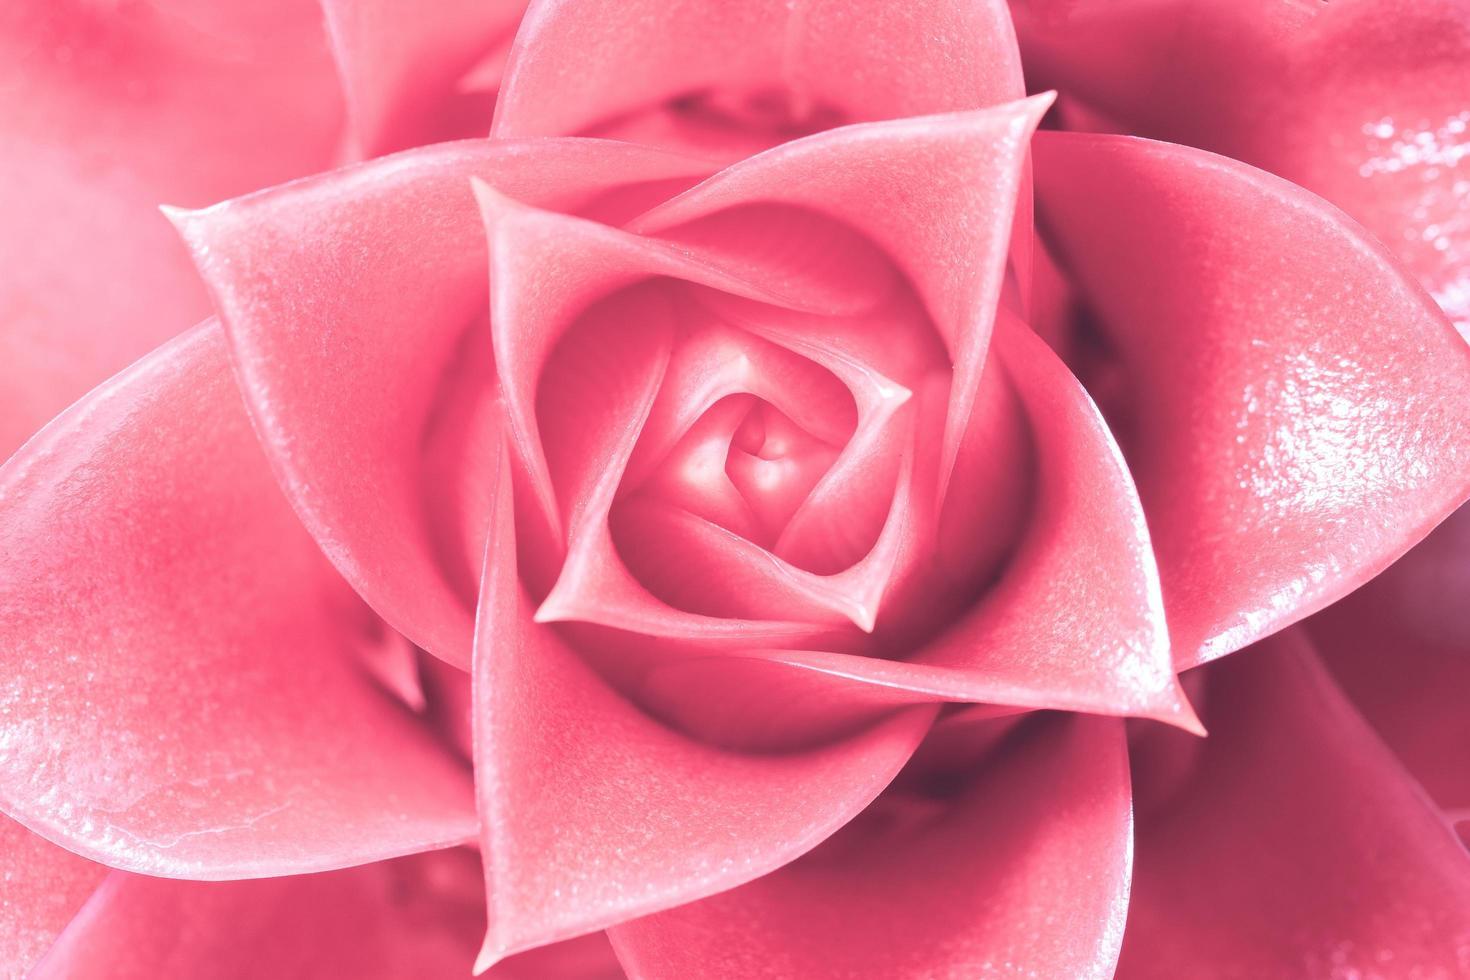 ljusrosa blomma bakgrund foto